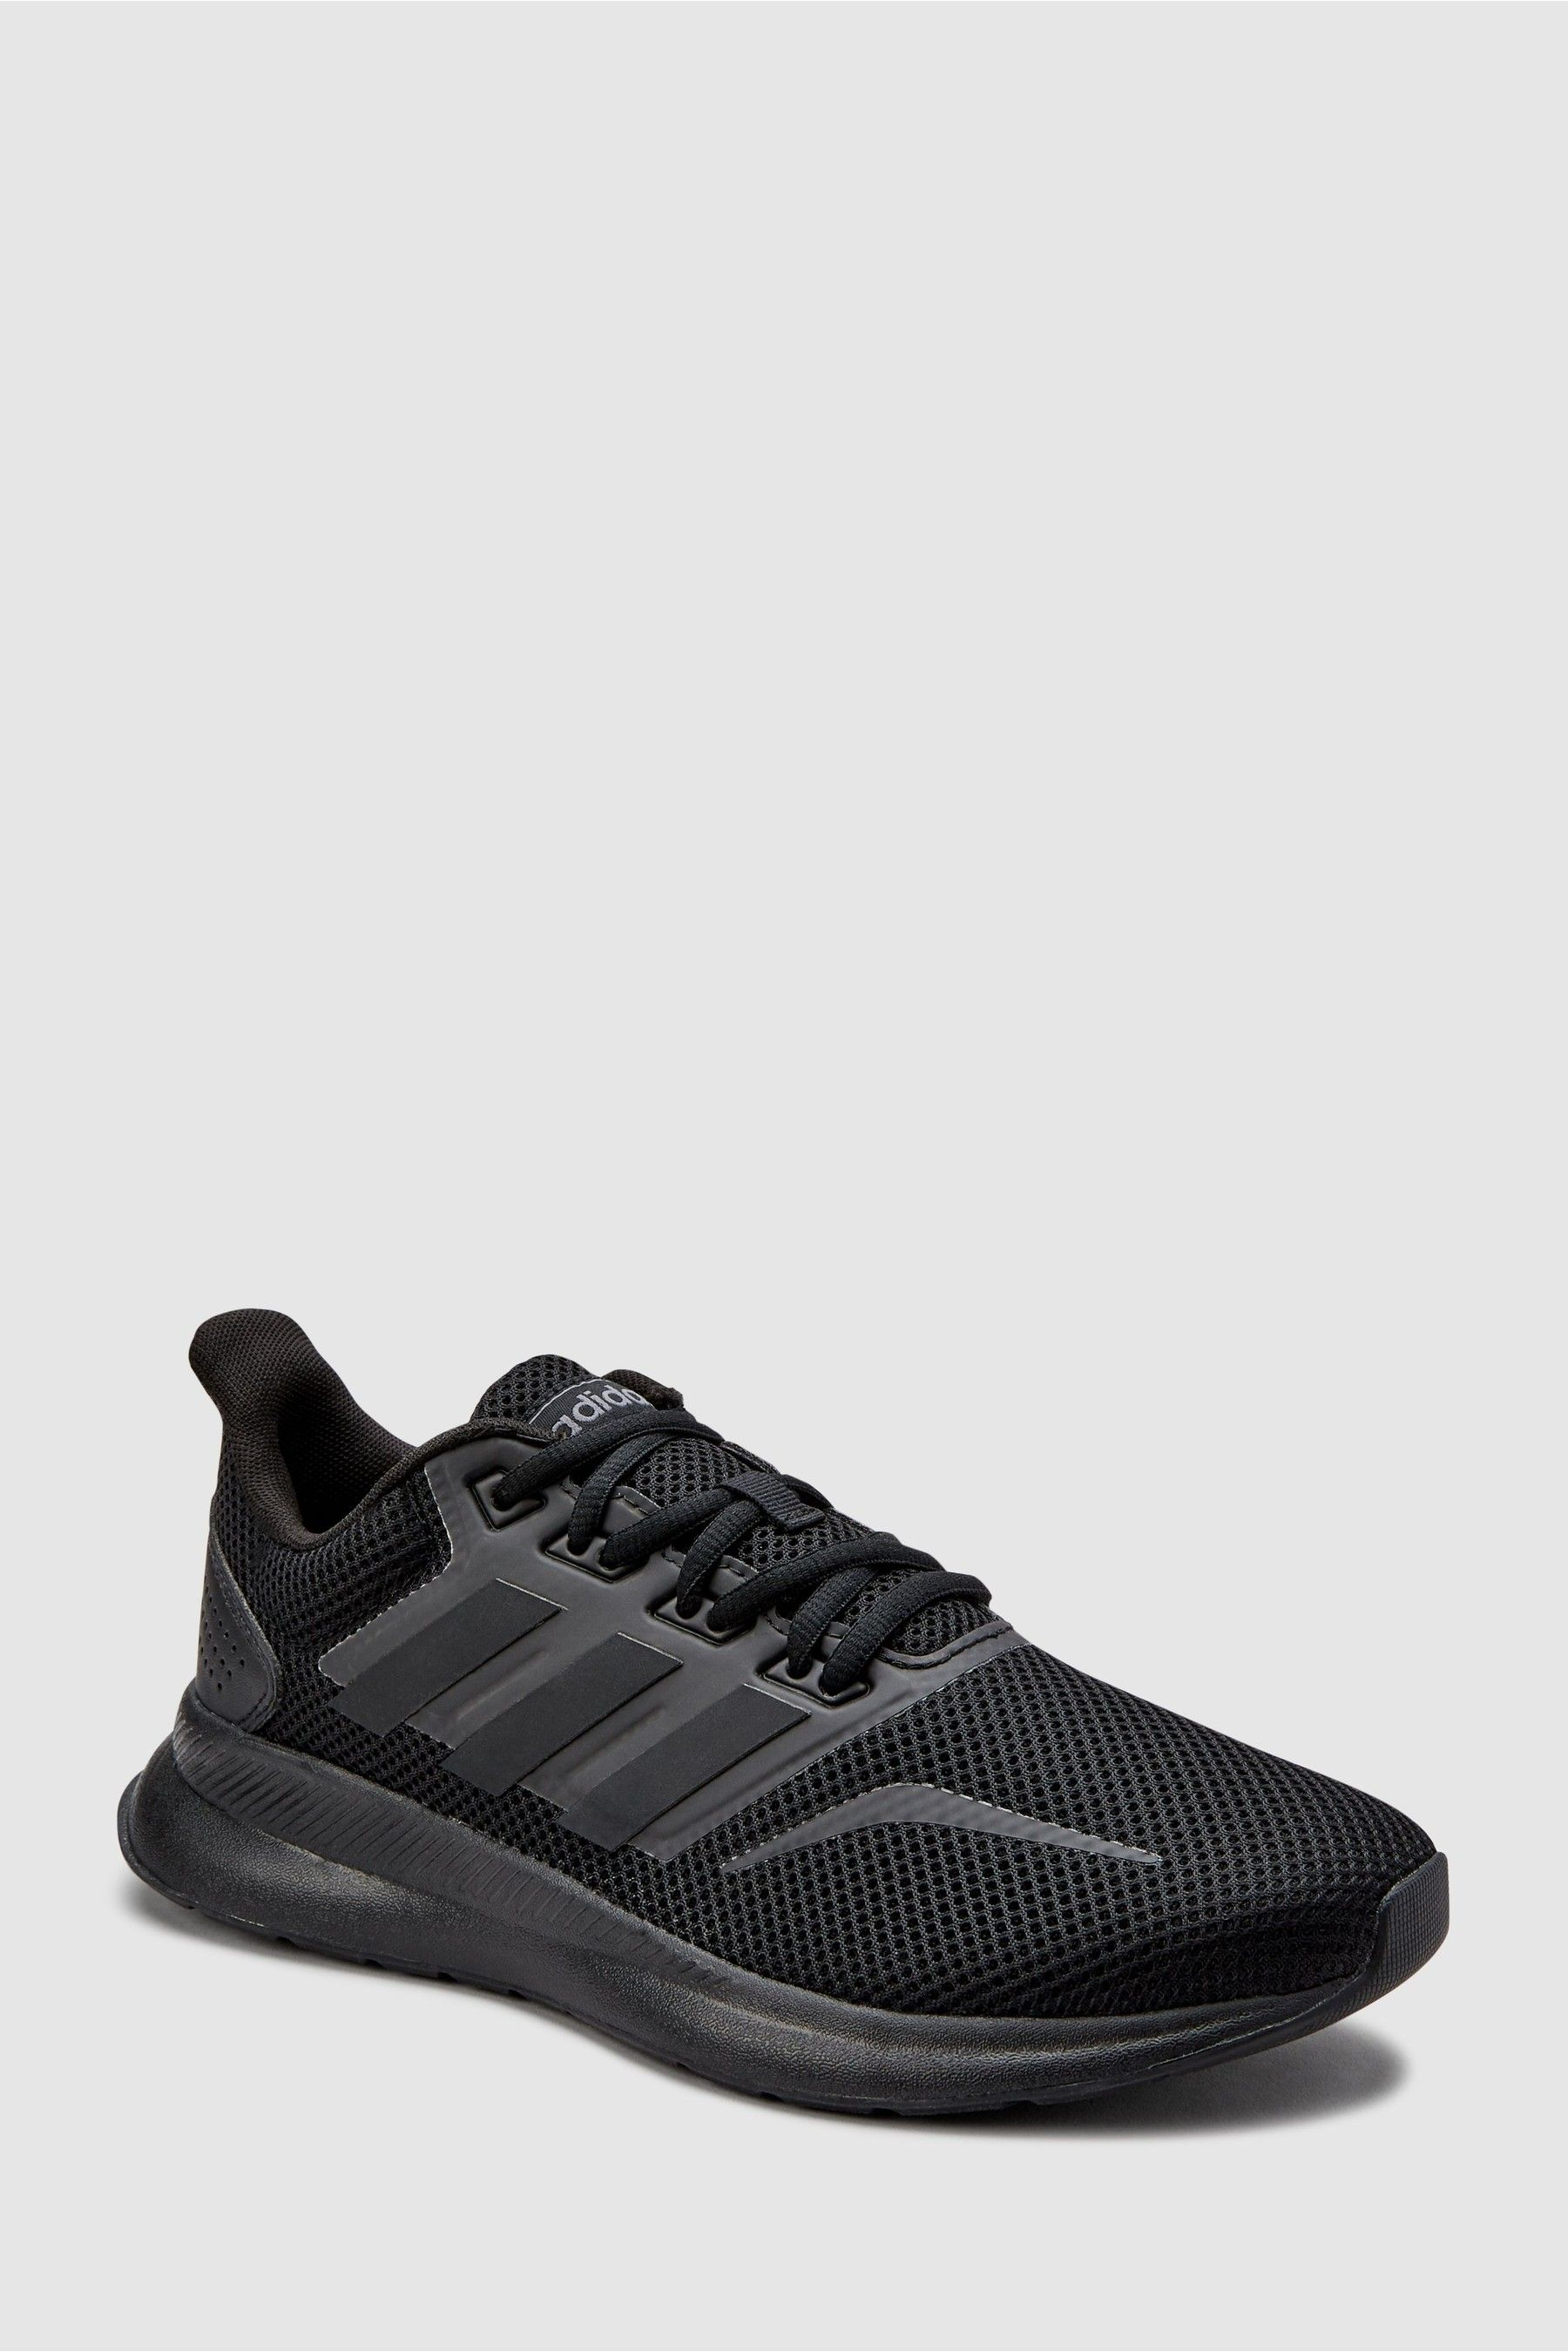 Womens adidas Run Falcon Trainers Black | Lightweight